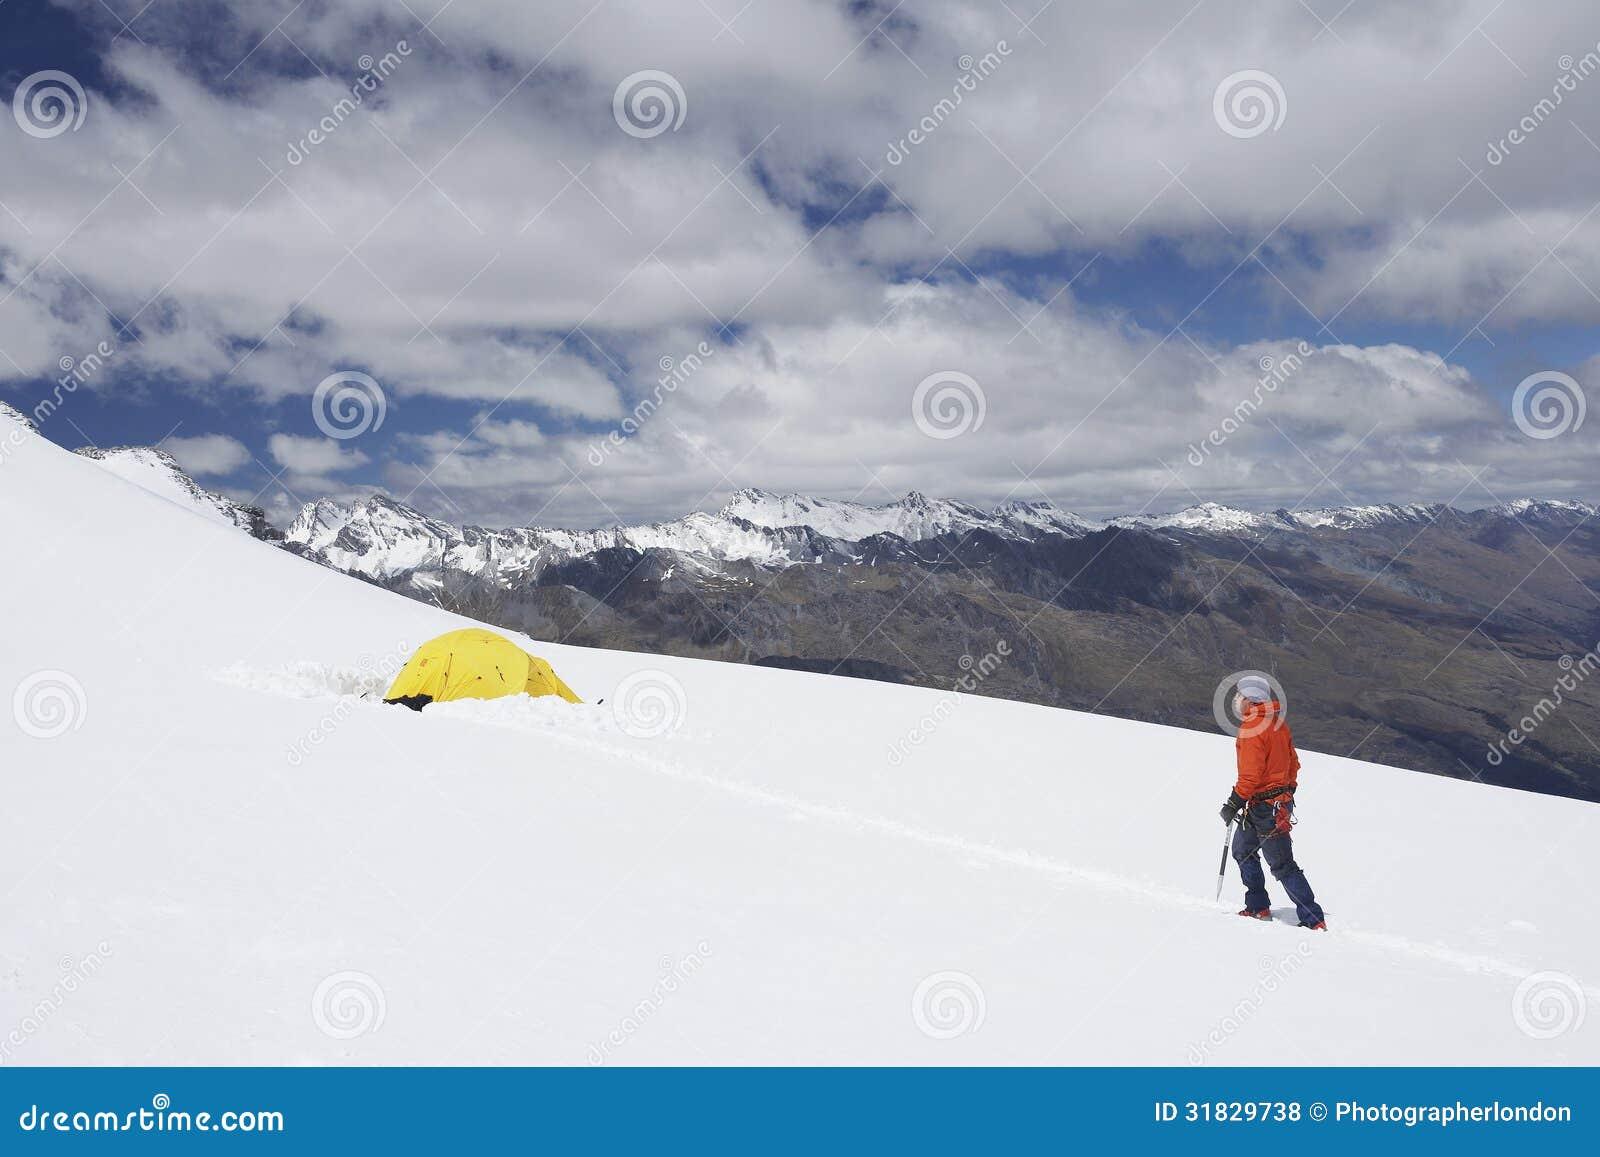 towards the snowy - photo #33